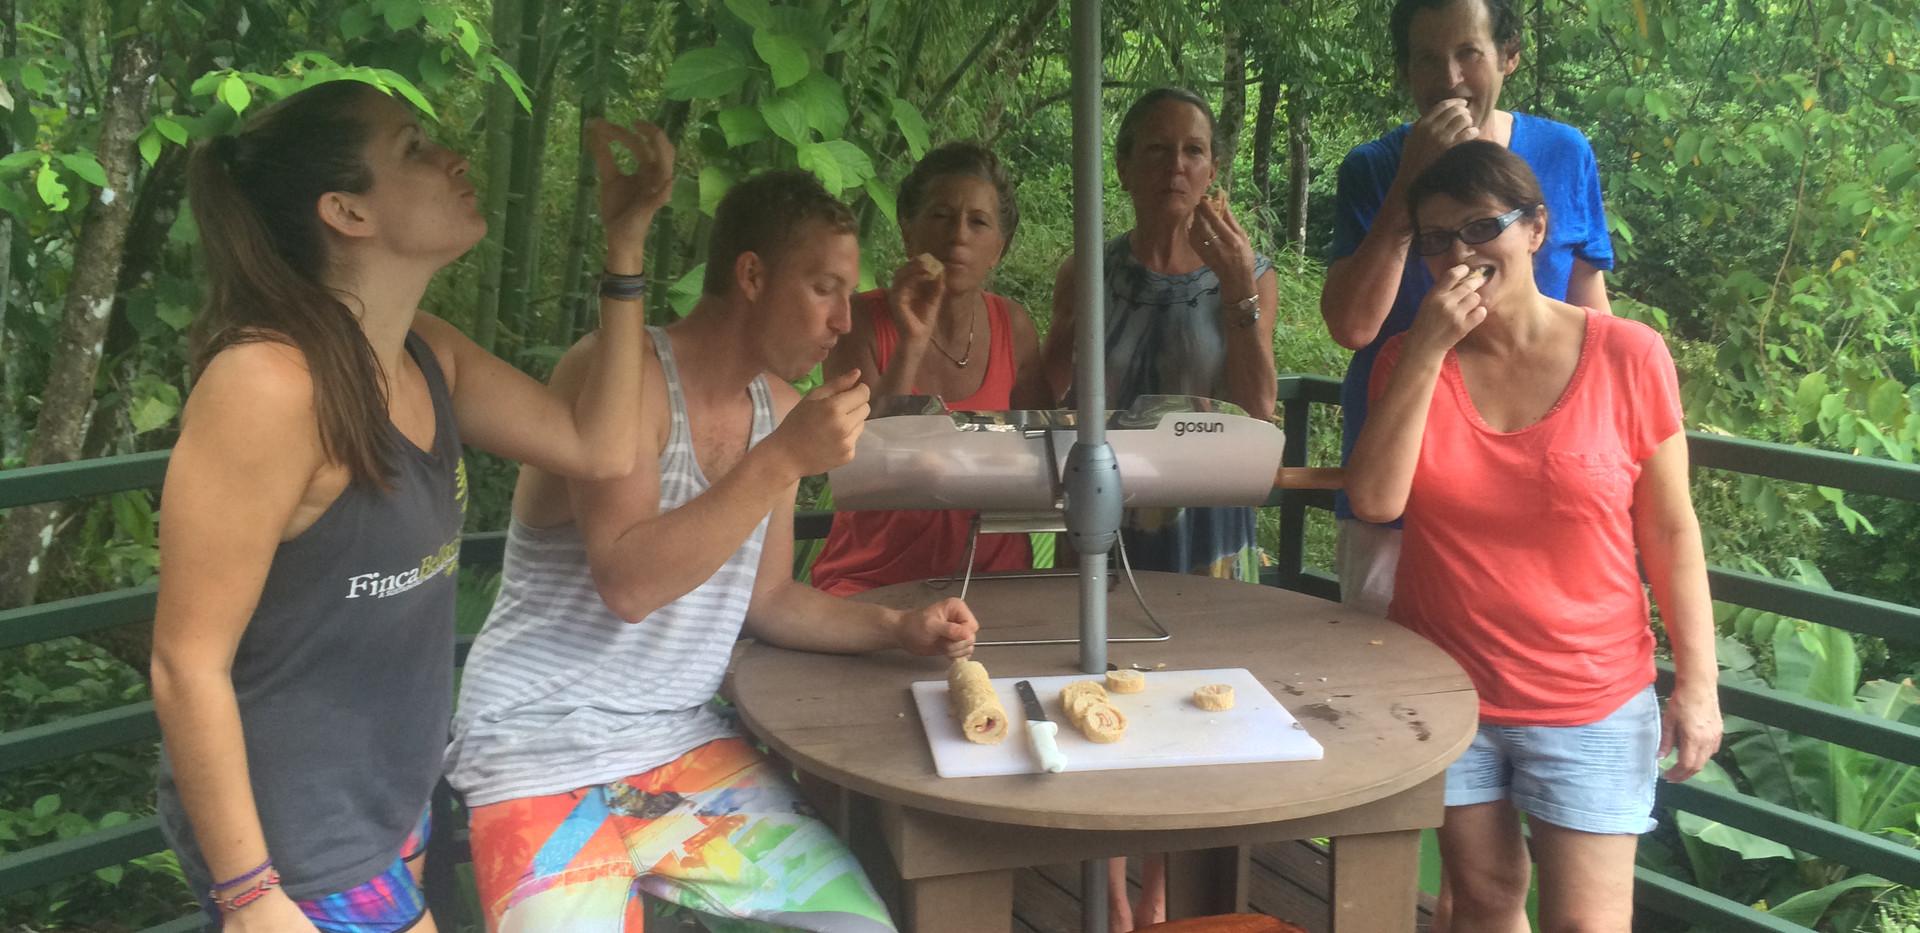 Making solar powered bread